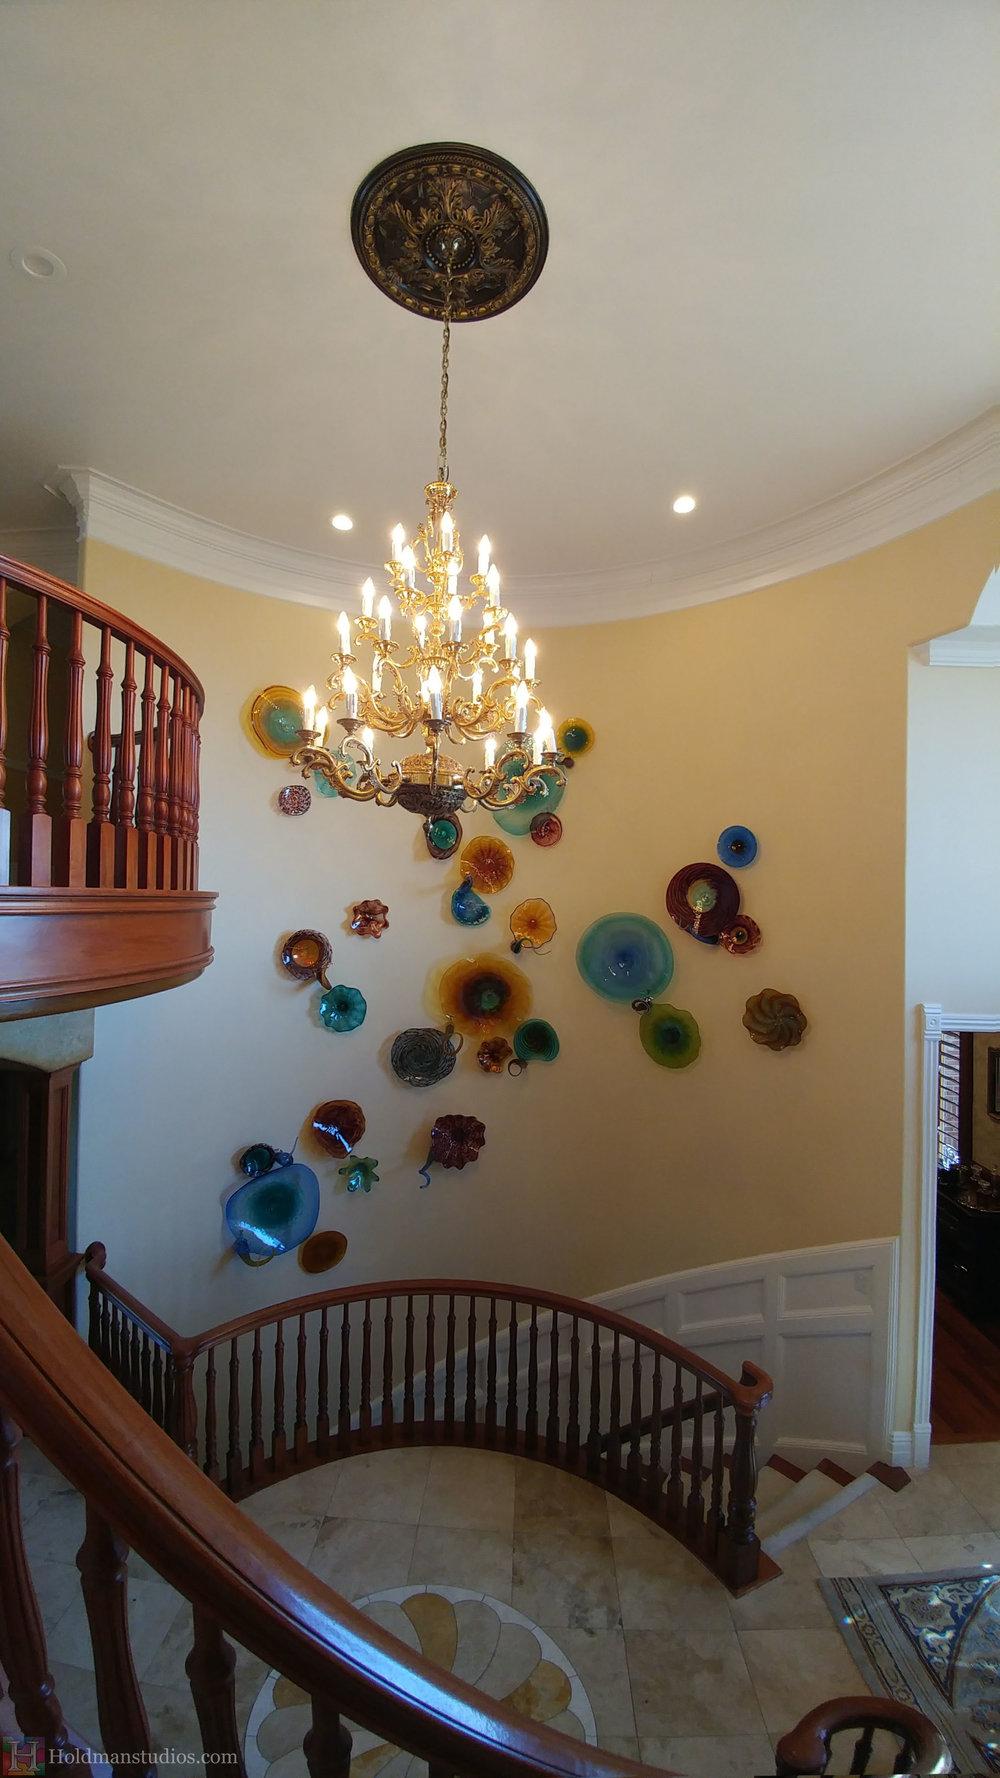 holdman-studios-hand-blown-glass-platter-bowls-tendrils-stair-wall-display.jpg